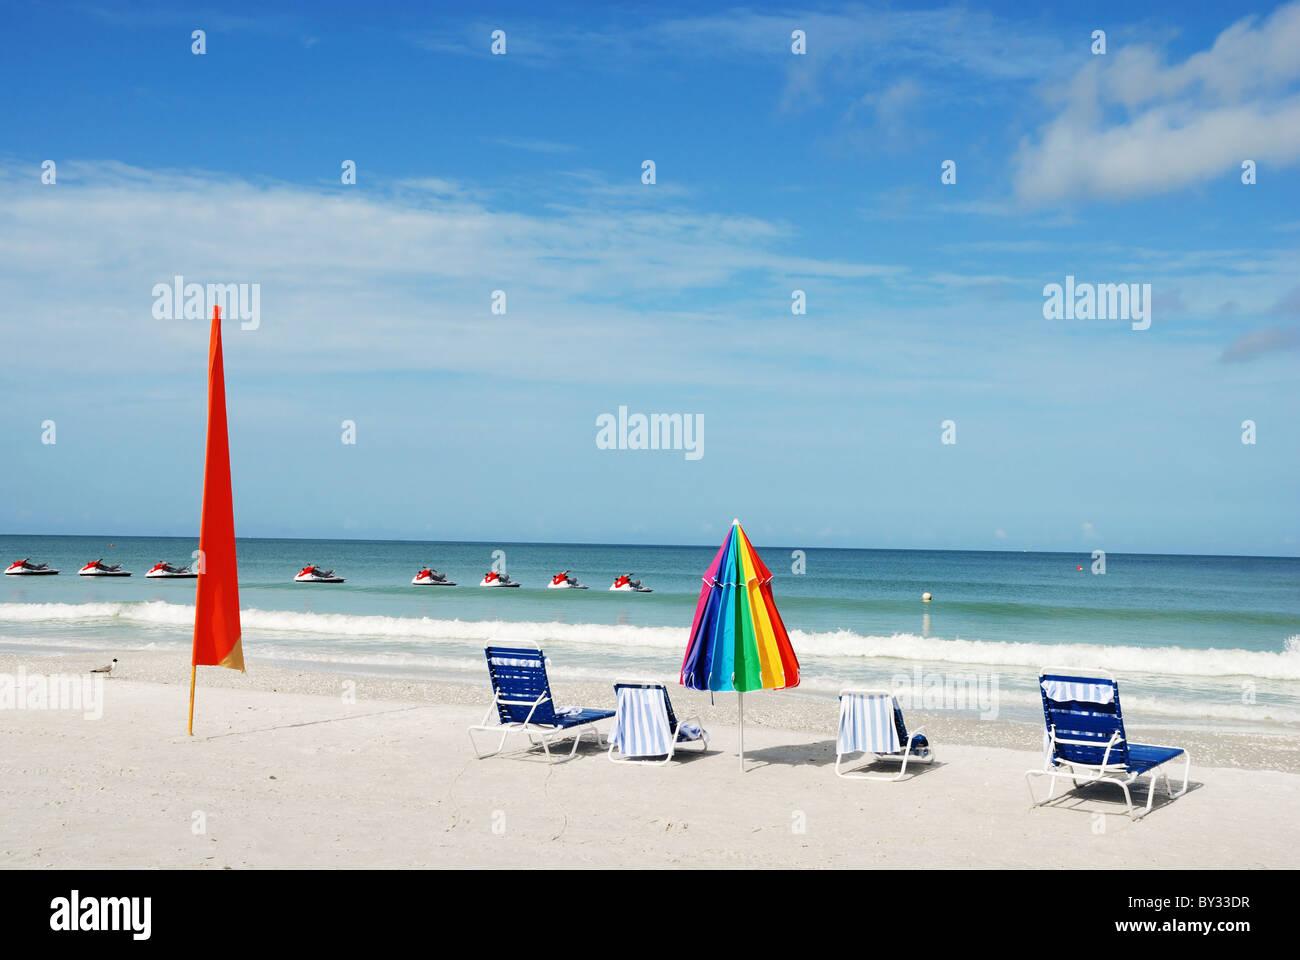 Ruhige Strand-Szene auf Marco Island Florida FL USA Stockbild